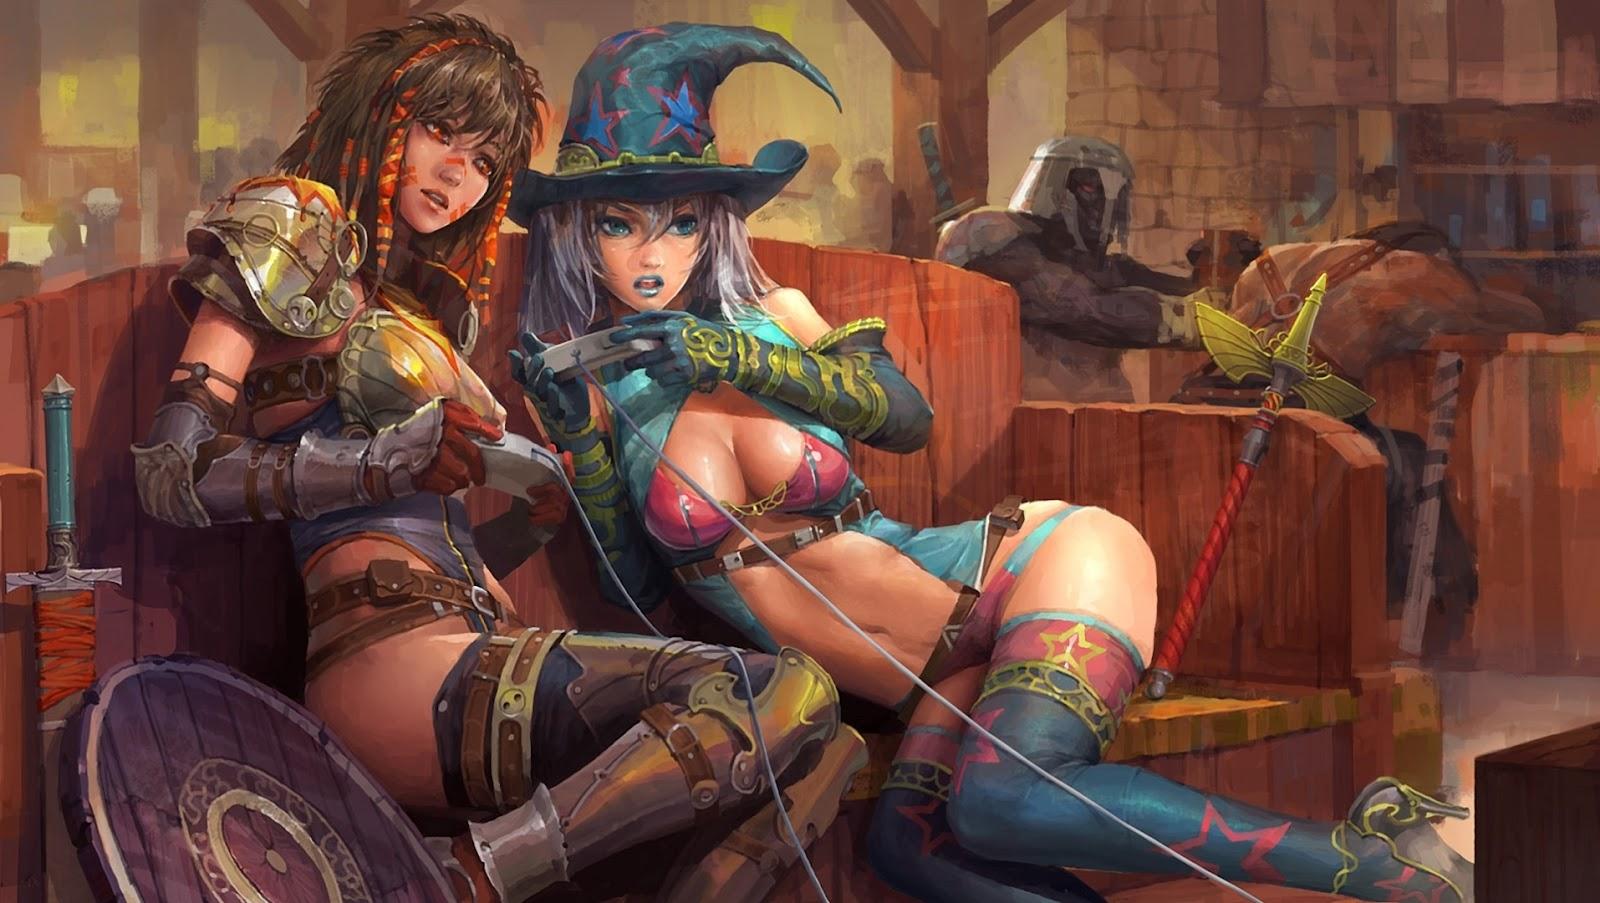 Anime girls 3d games video dawanlod free porn pics